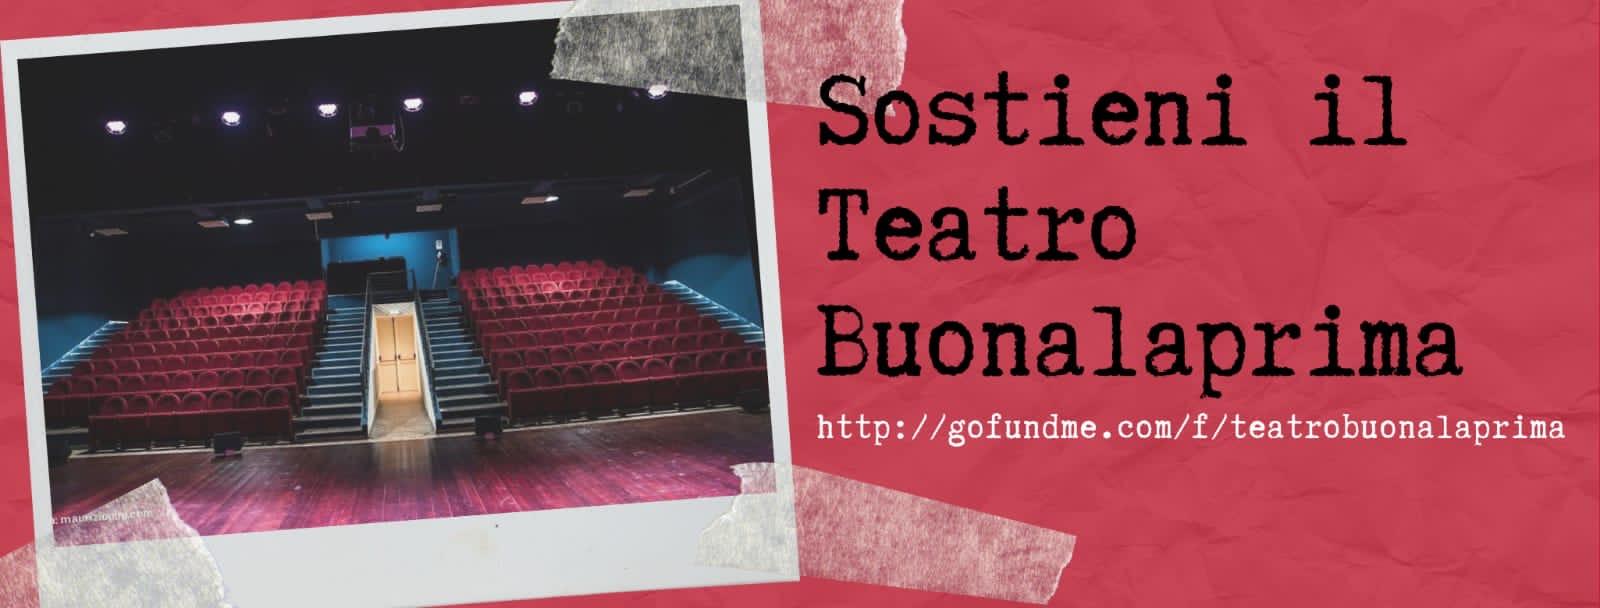 isolamento teatrale crowdfunding